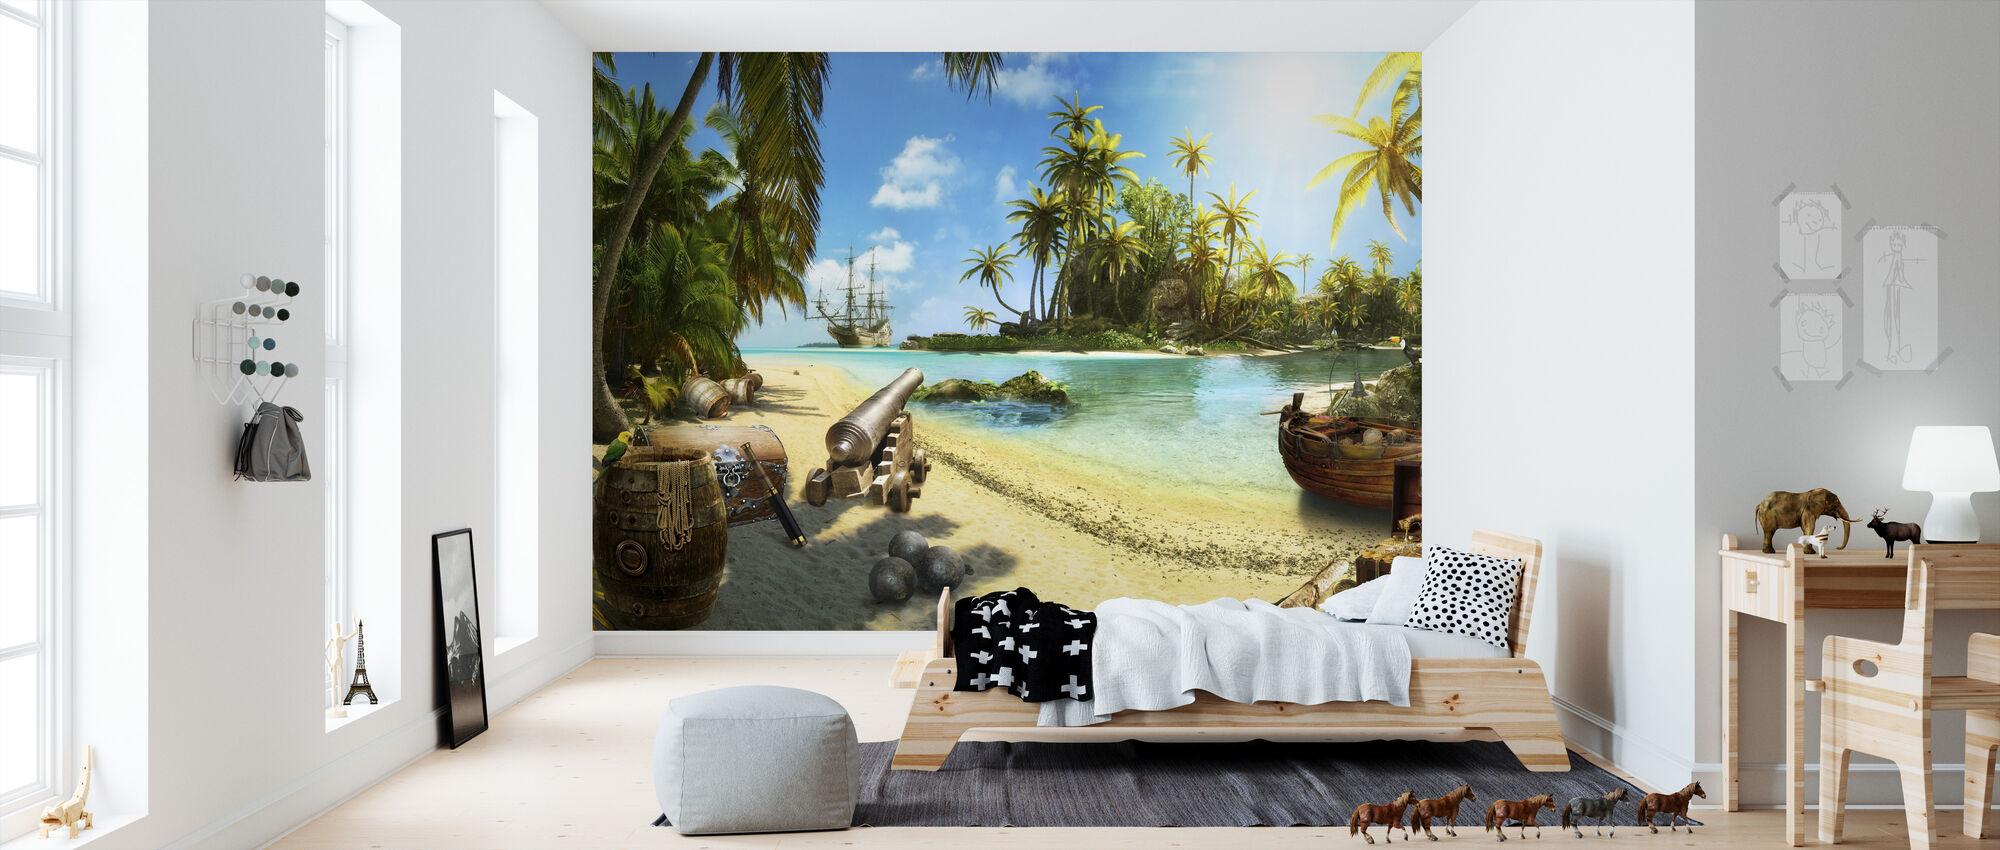 Pirate Island - Tapet - Barnrum